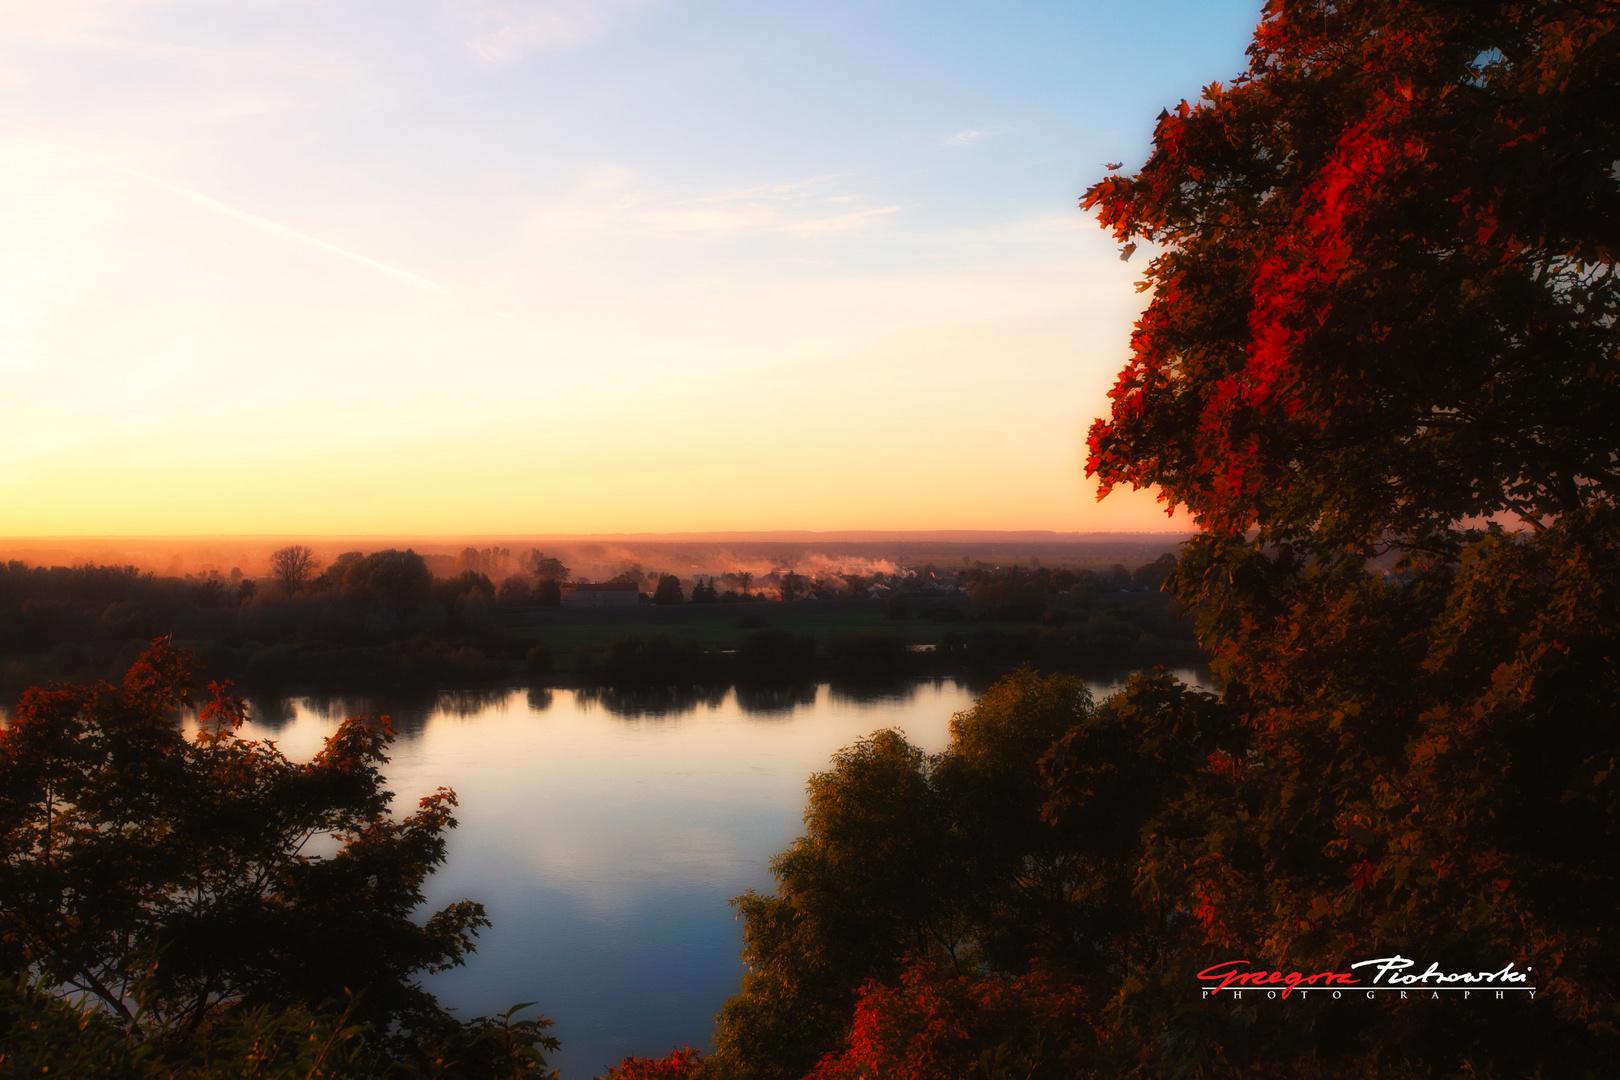 A View on Vistula River - Grudziadz - Poland